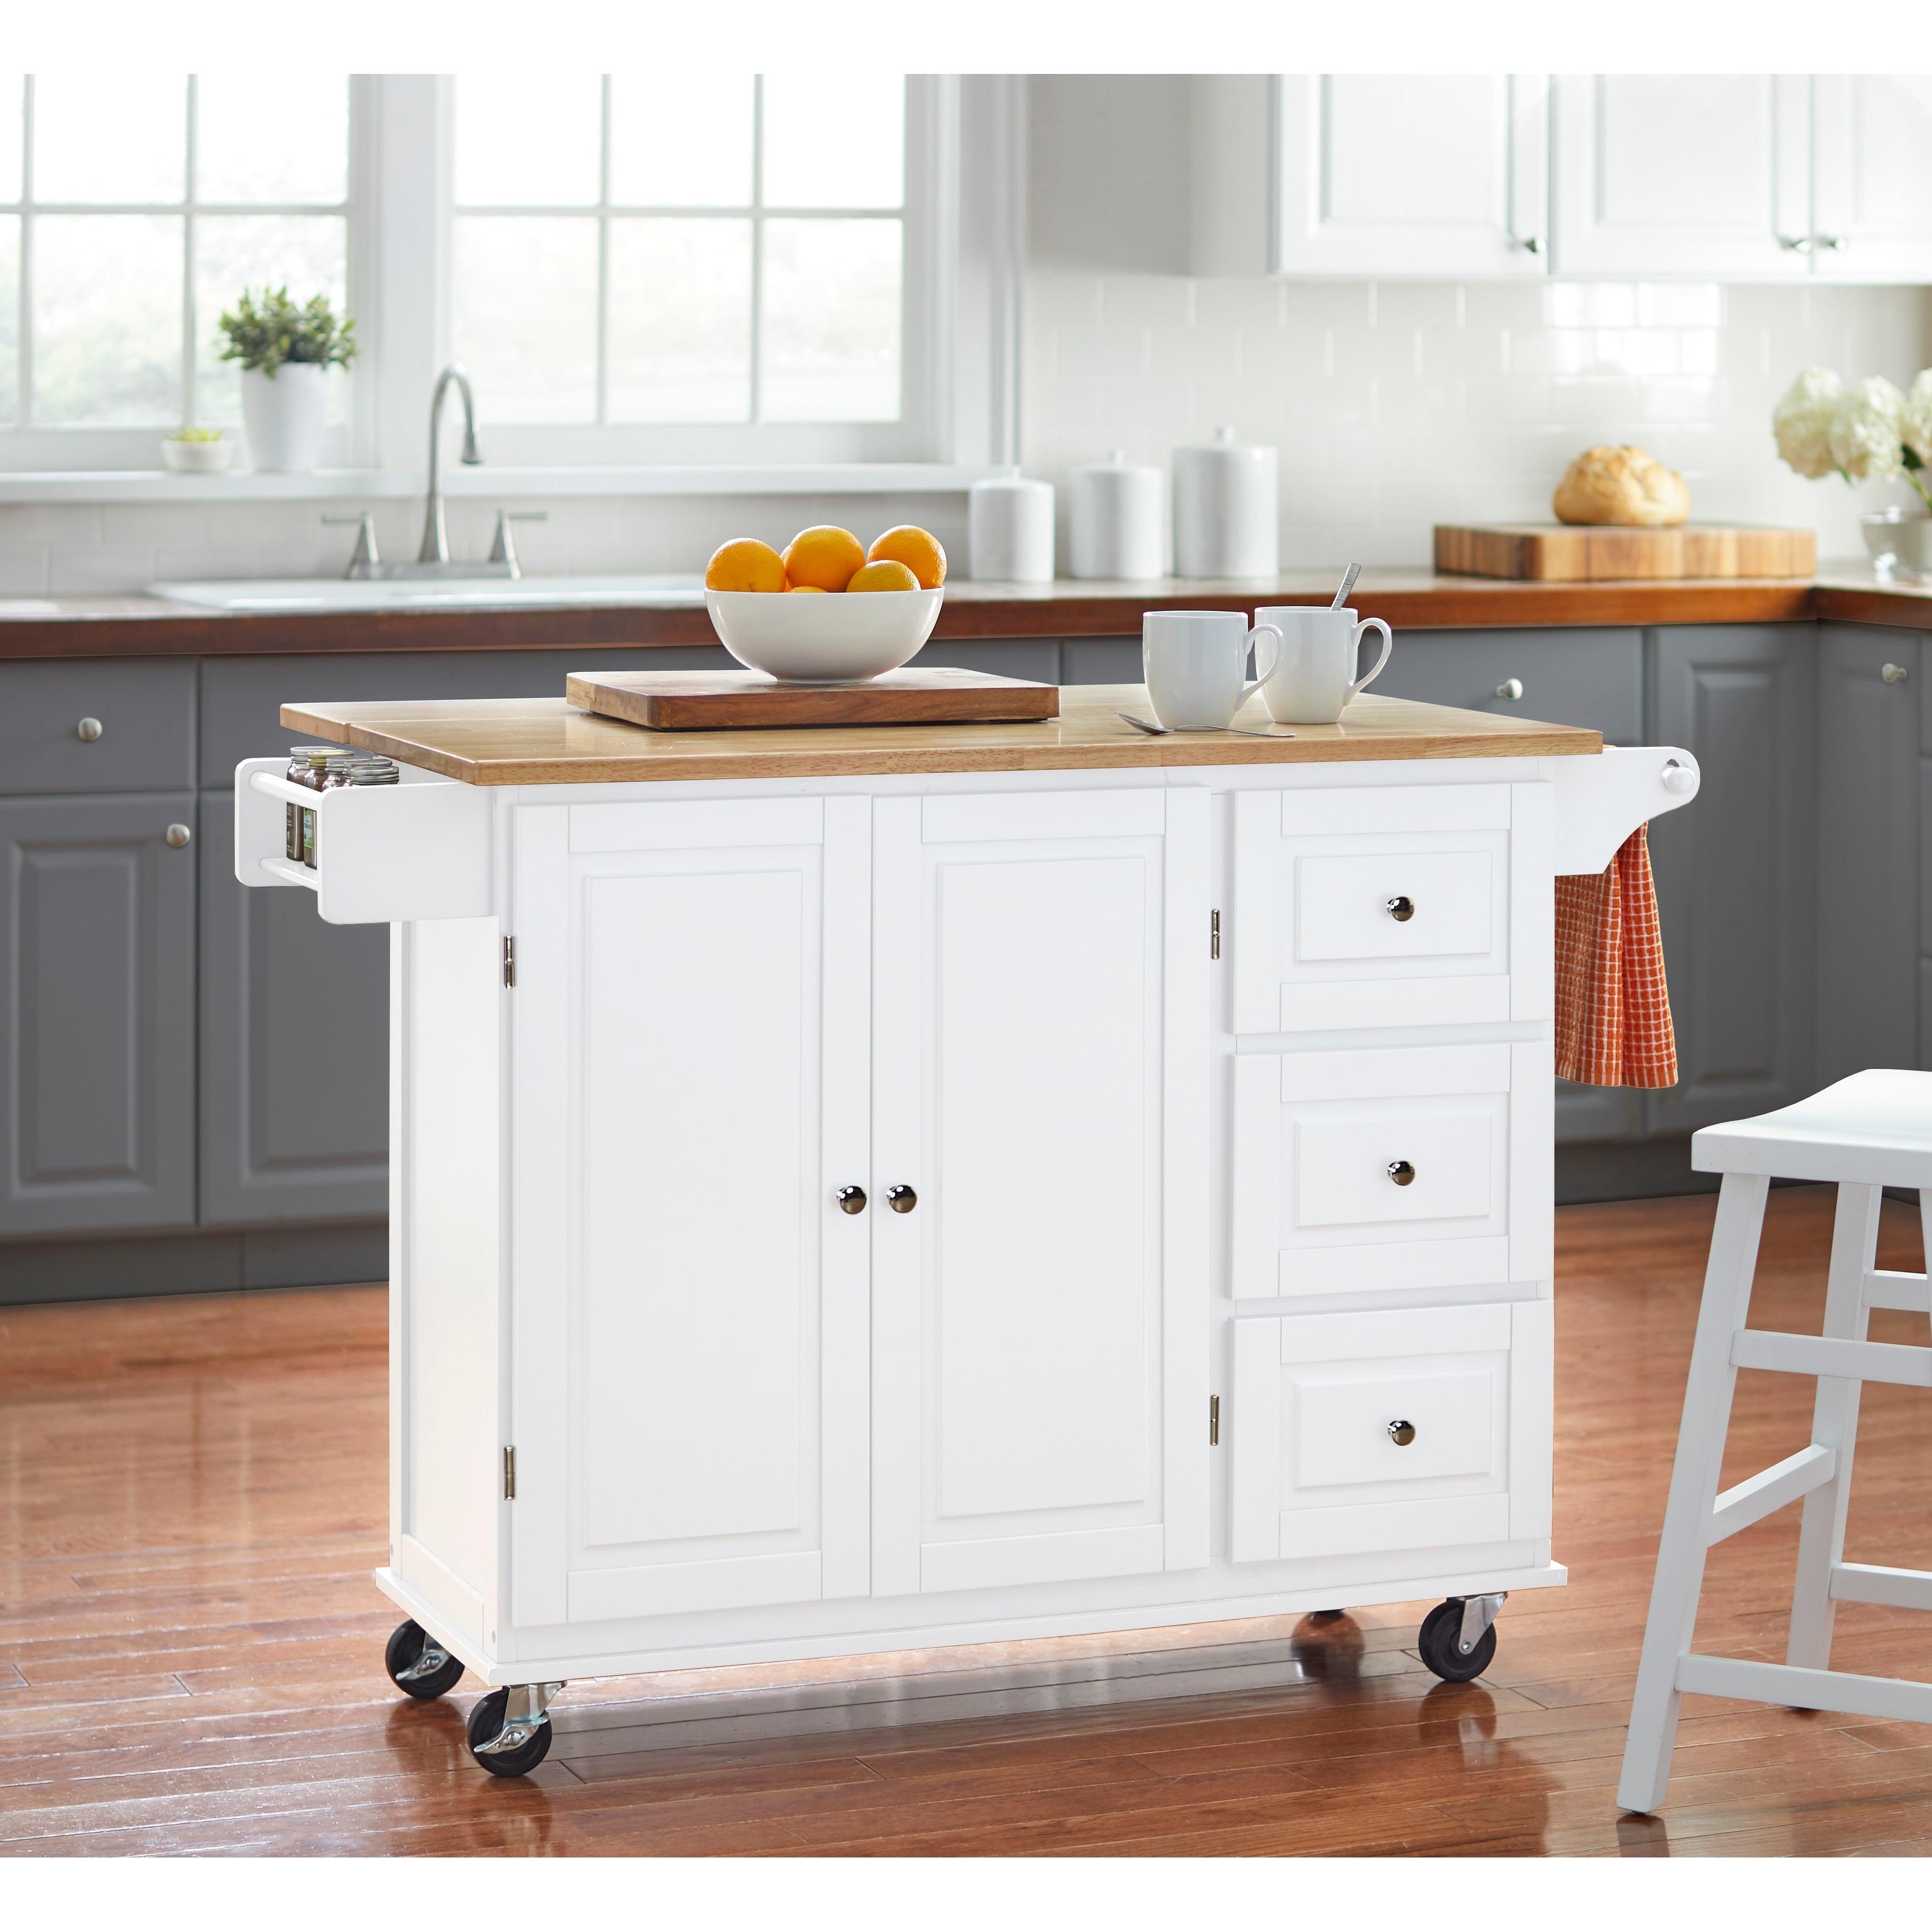 3 Drawer Drop Leaf Kitchen Cart Overstock 20602808